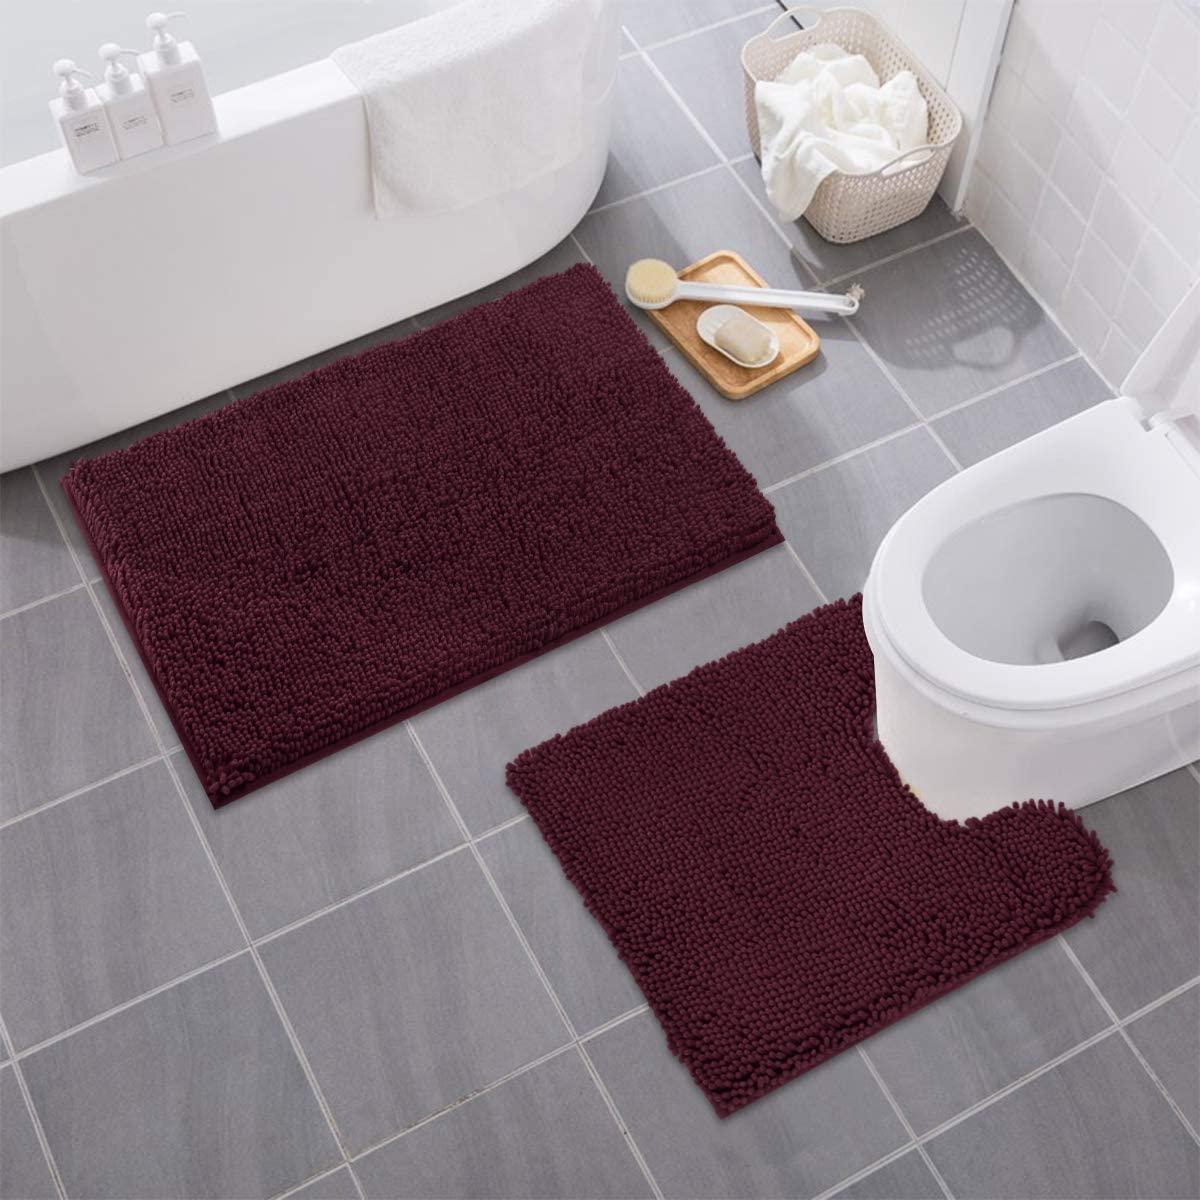 MAYSHINE Bathroom Rug Toilet Sets and Shaggy Non Slip Machine Washable Soft Microfiber Bath Contour Mat (Burgundy, 32x20 / 20x20 Inches U-Shaped)